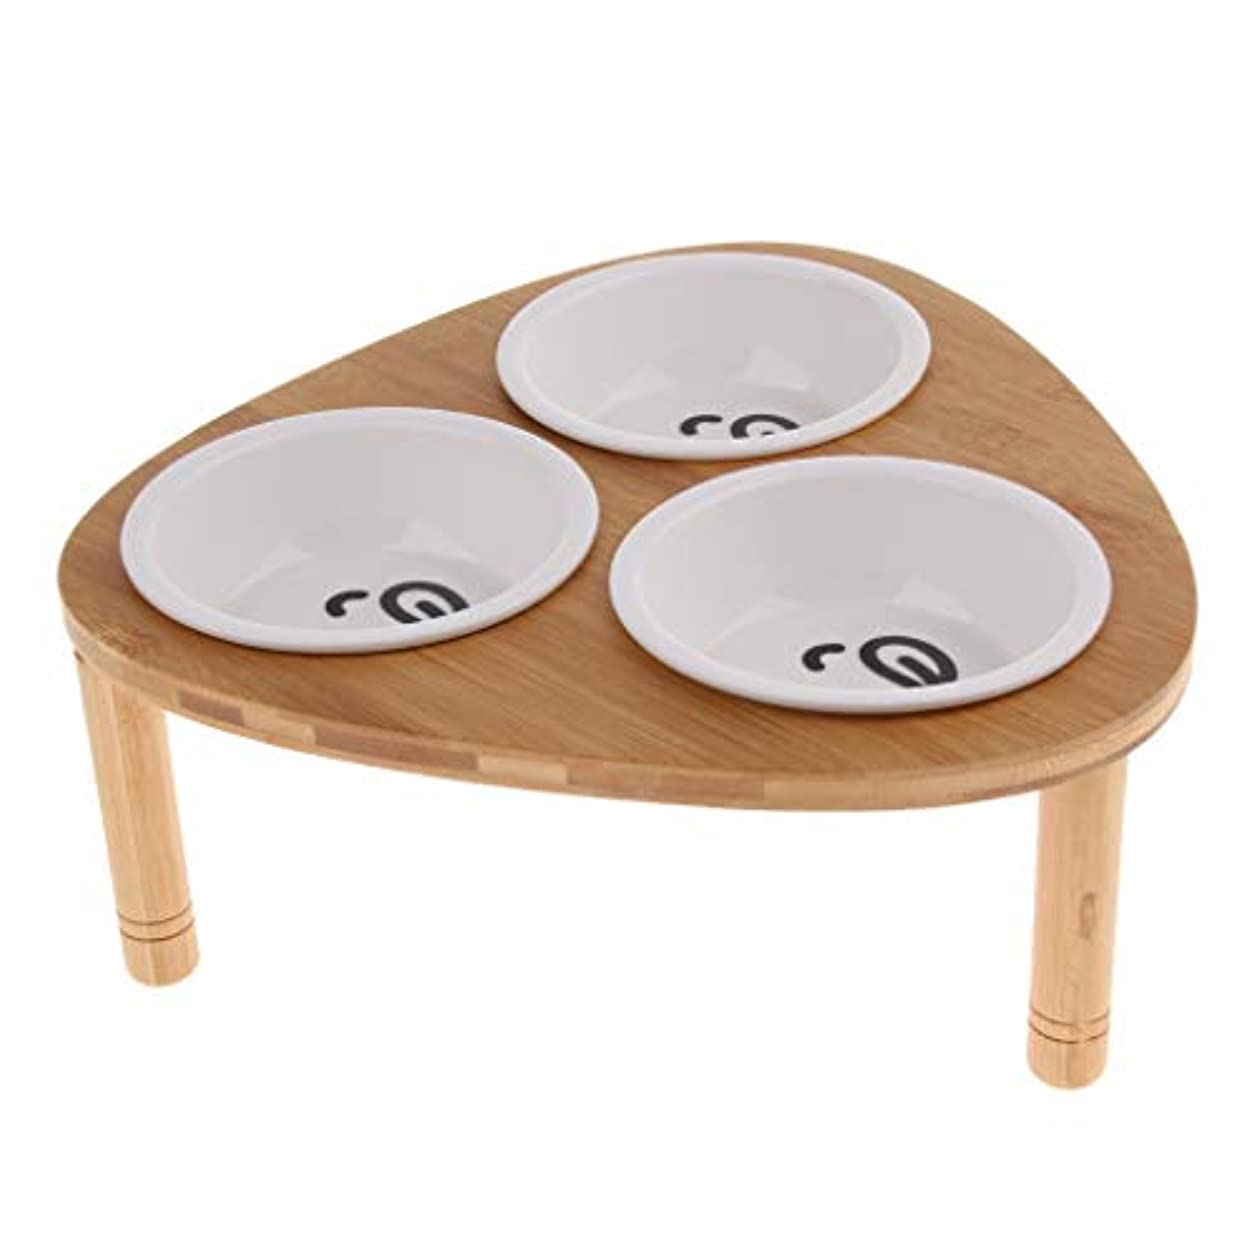 B Baosity ペット 食器 フード ご飯入れ ボウル 食事台 食器 水飲み 食器スタンド フードボウル 実用的